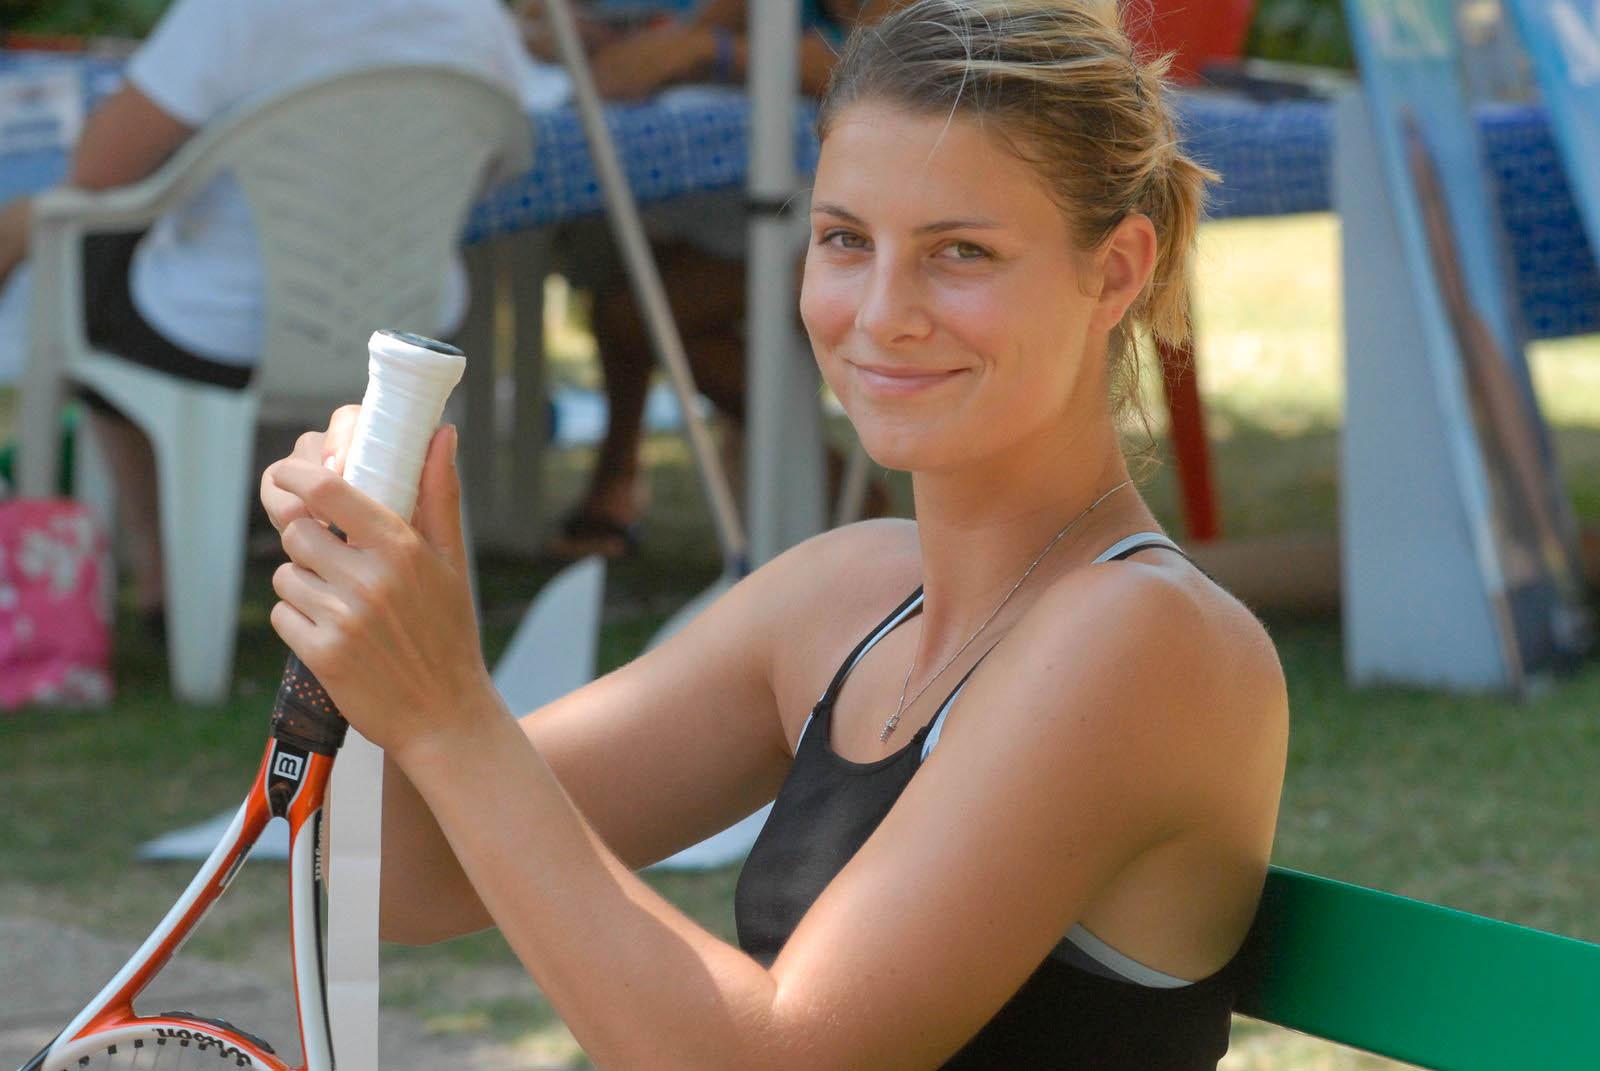 5 mandy minella tennis - 2013 australian open